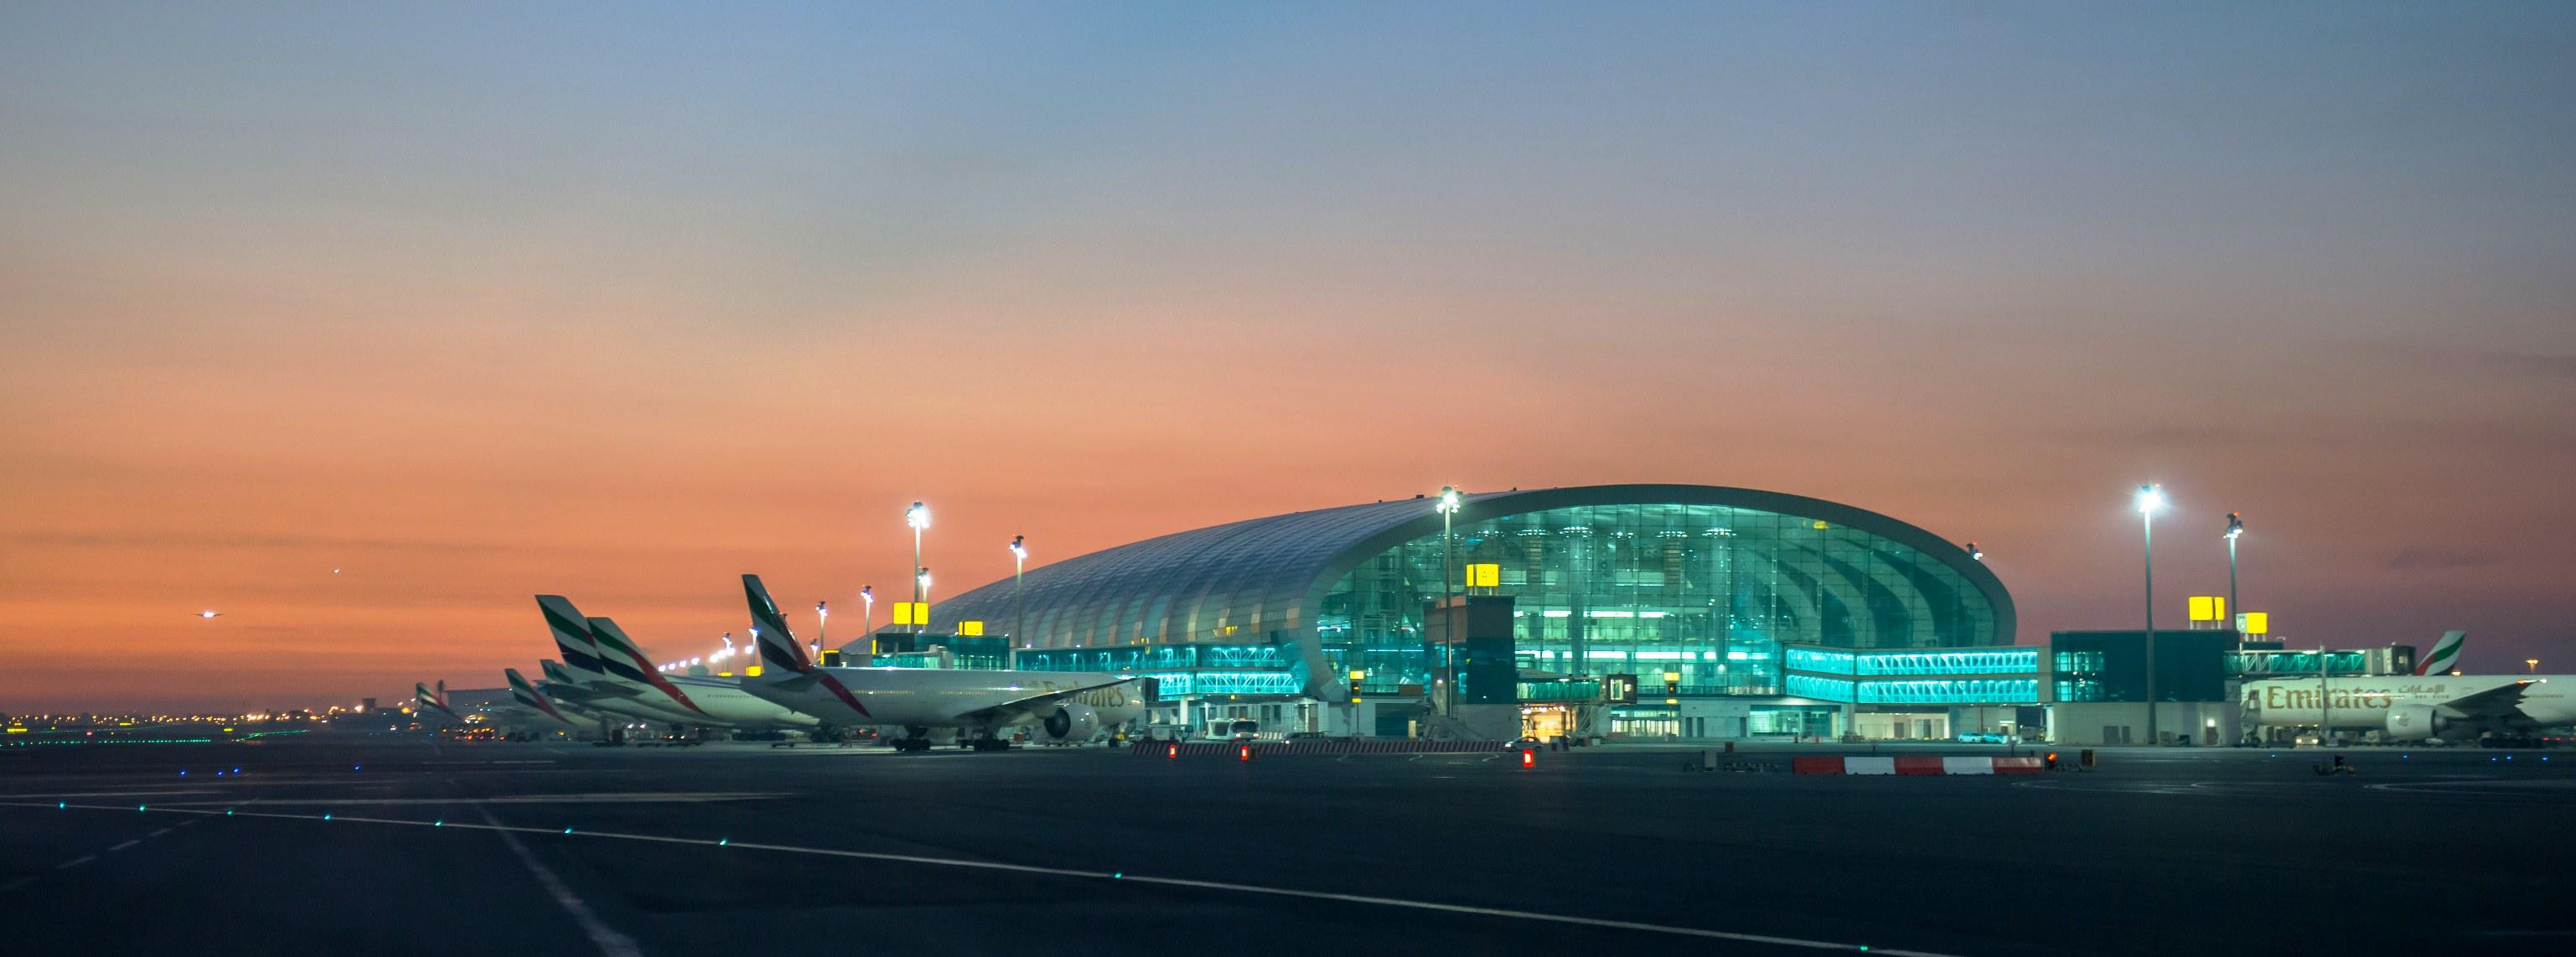 مطار دبى الدولى - dubai airport (3)